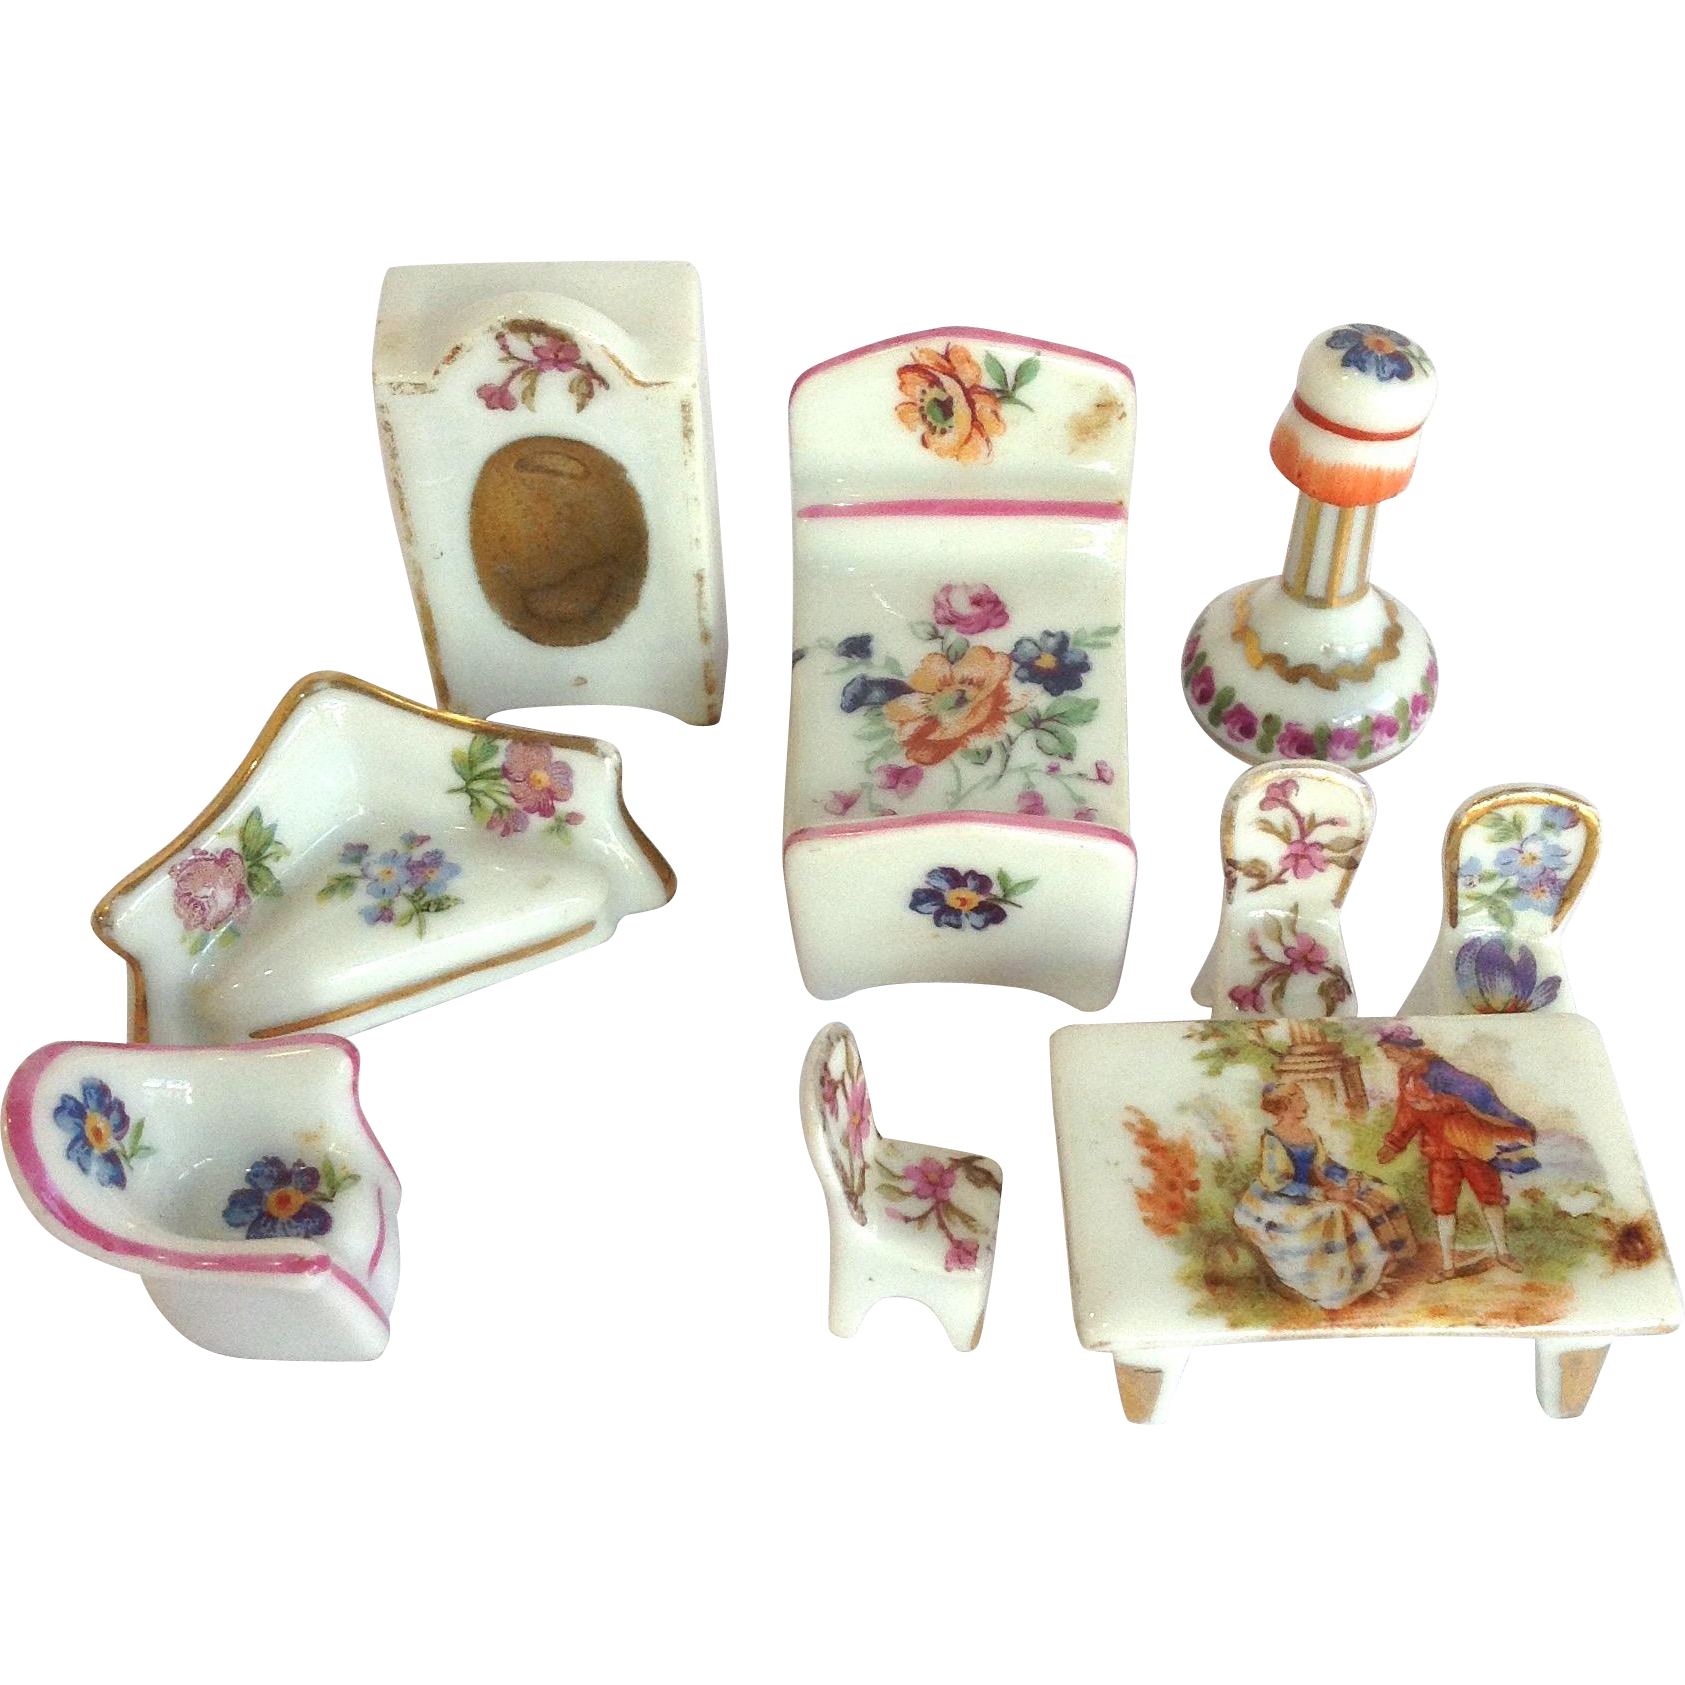 9 Limoges Porcelain Furniture Miniatures From